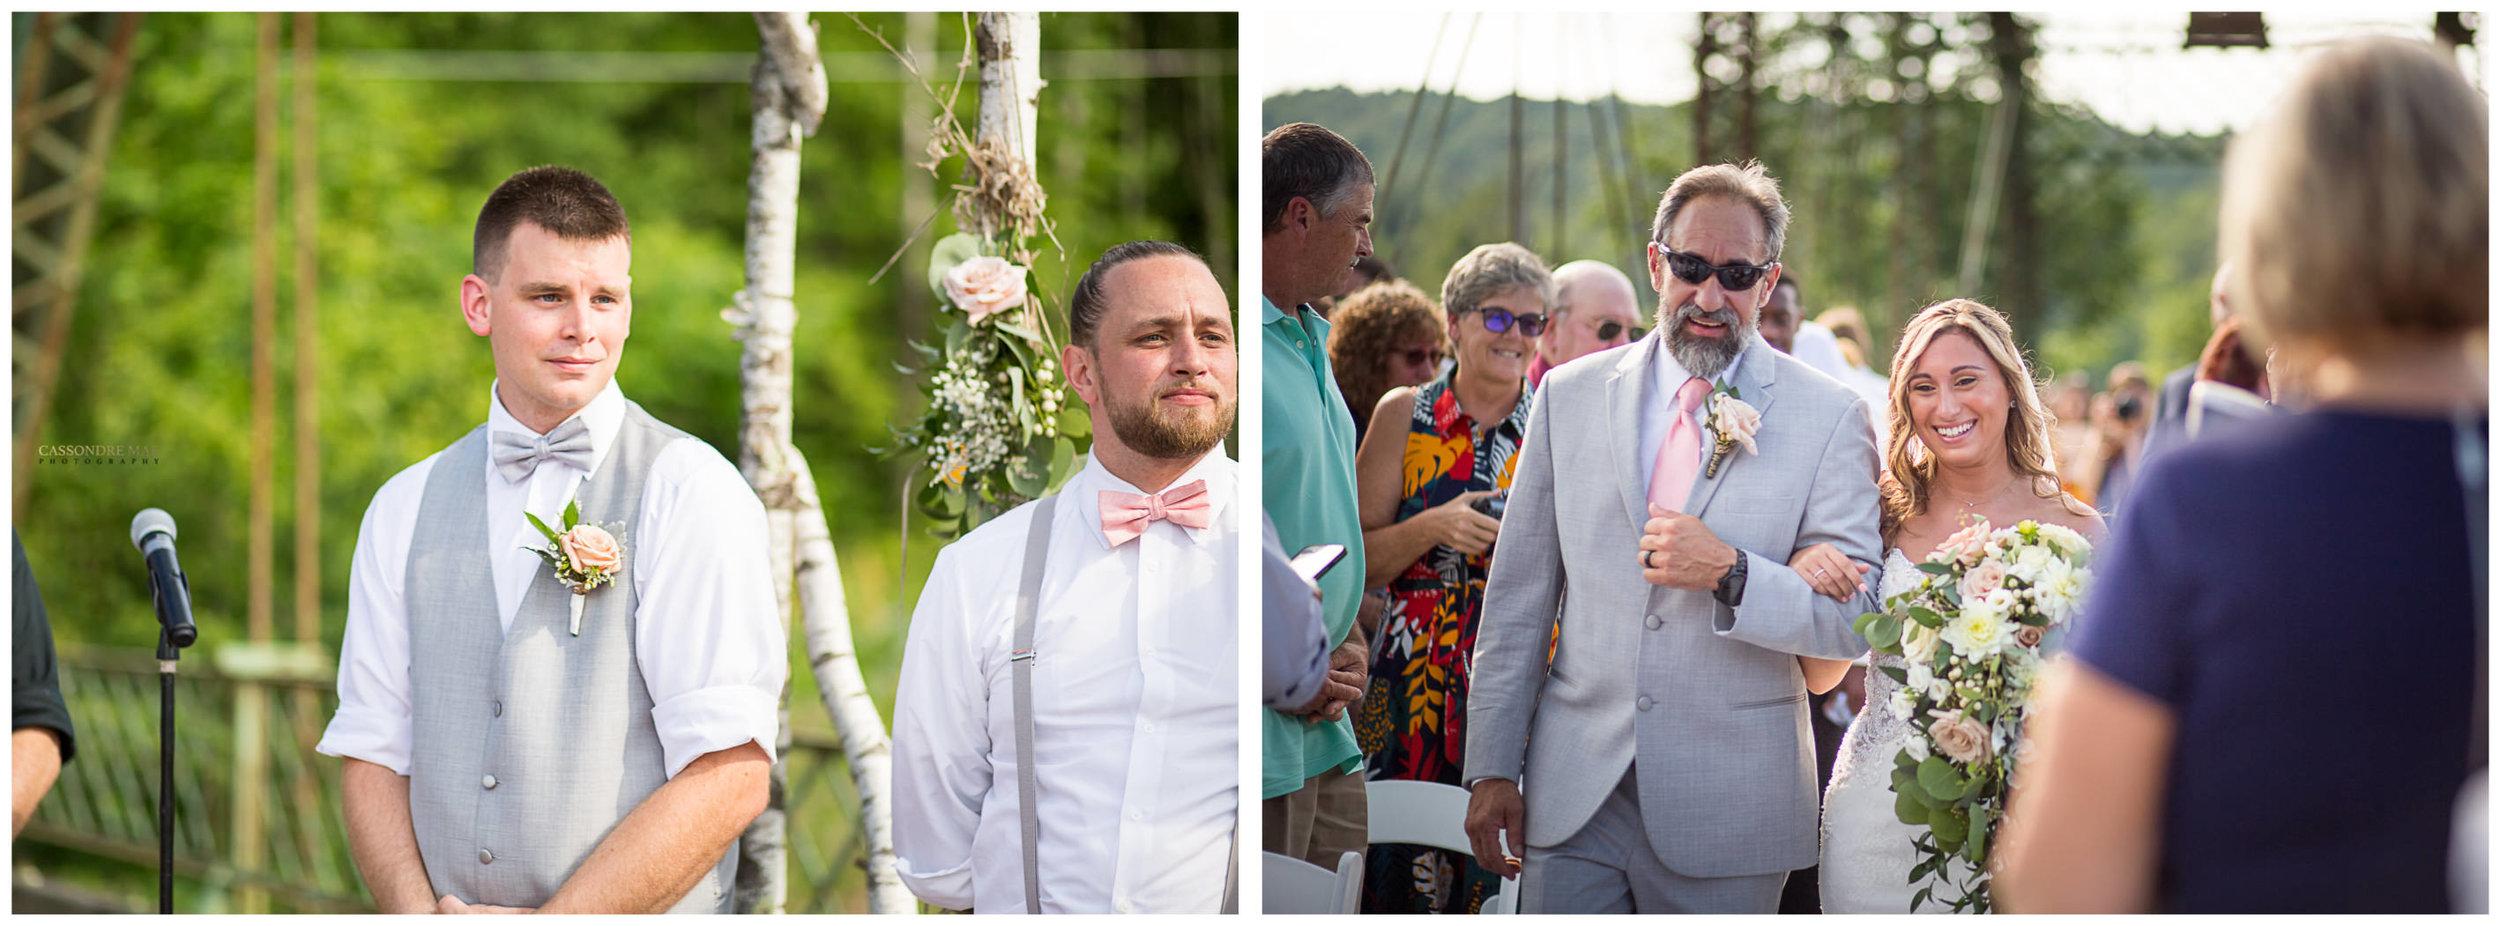 Cassondre Mae Photography Hudson Valley Wedding 13.jpg